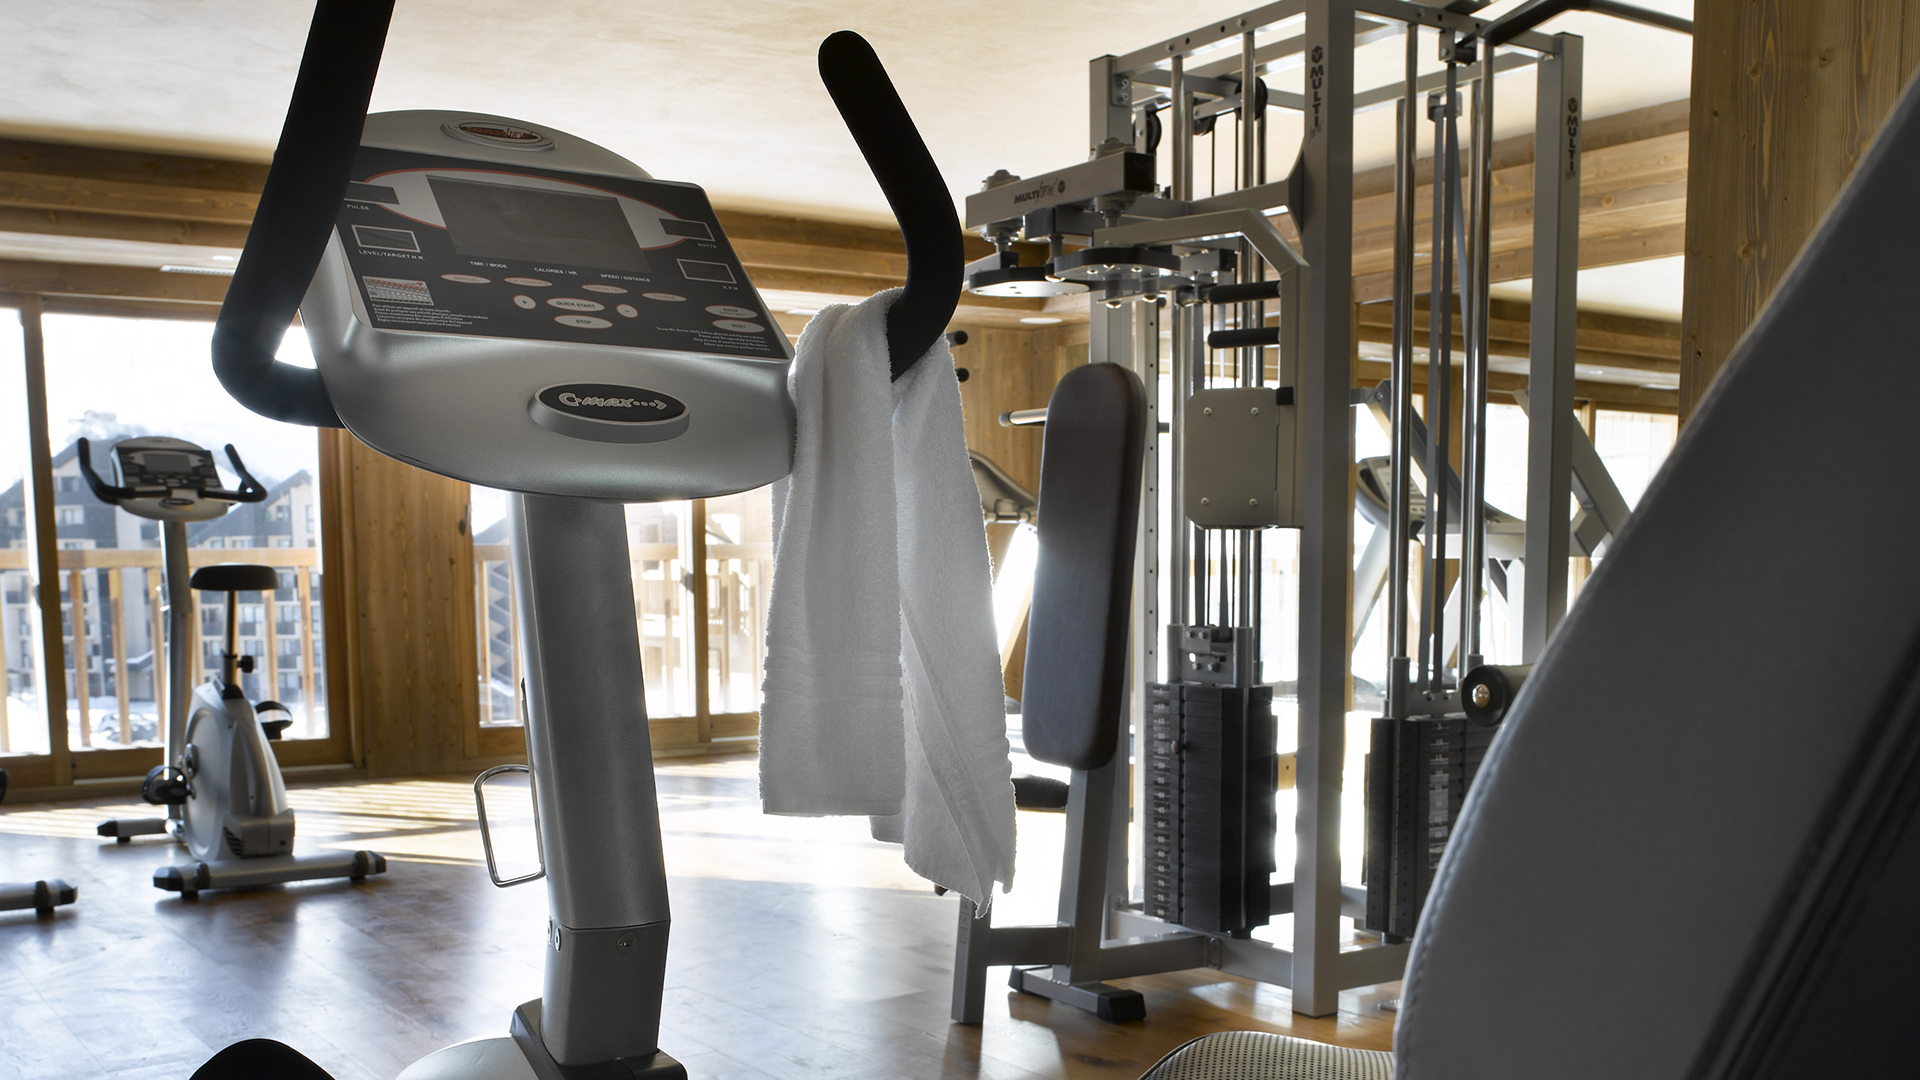 Salle de cardio-training, Les Clarines - CGH Résidences